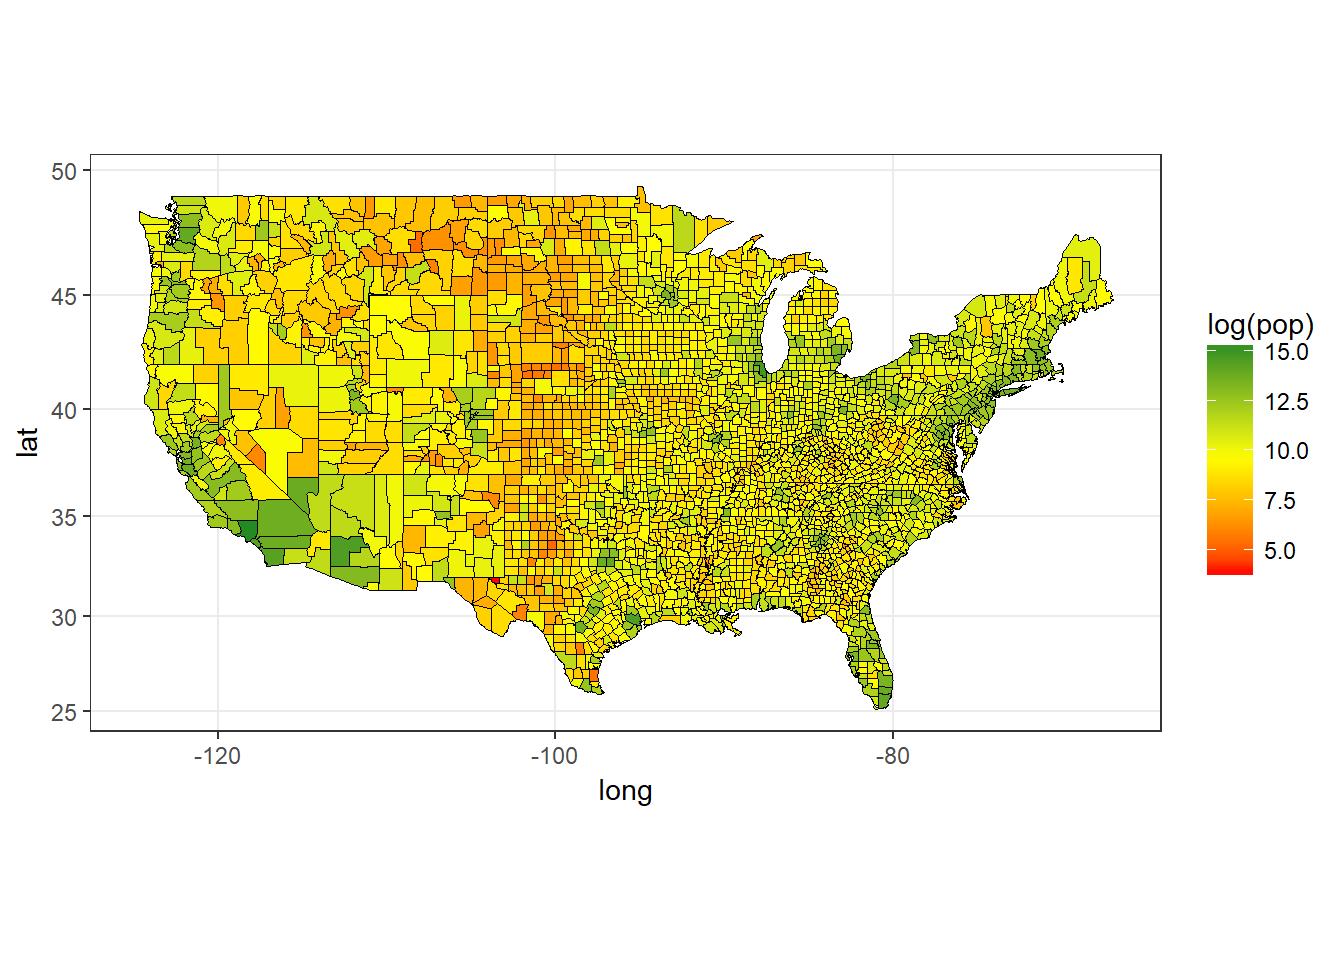 USA Population (Log) by County, 2009